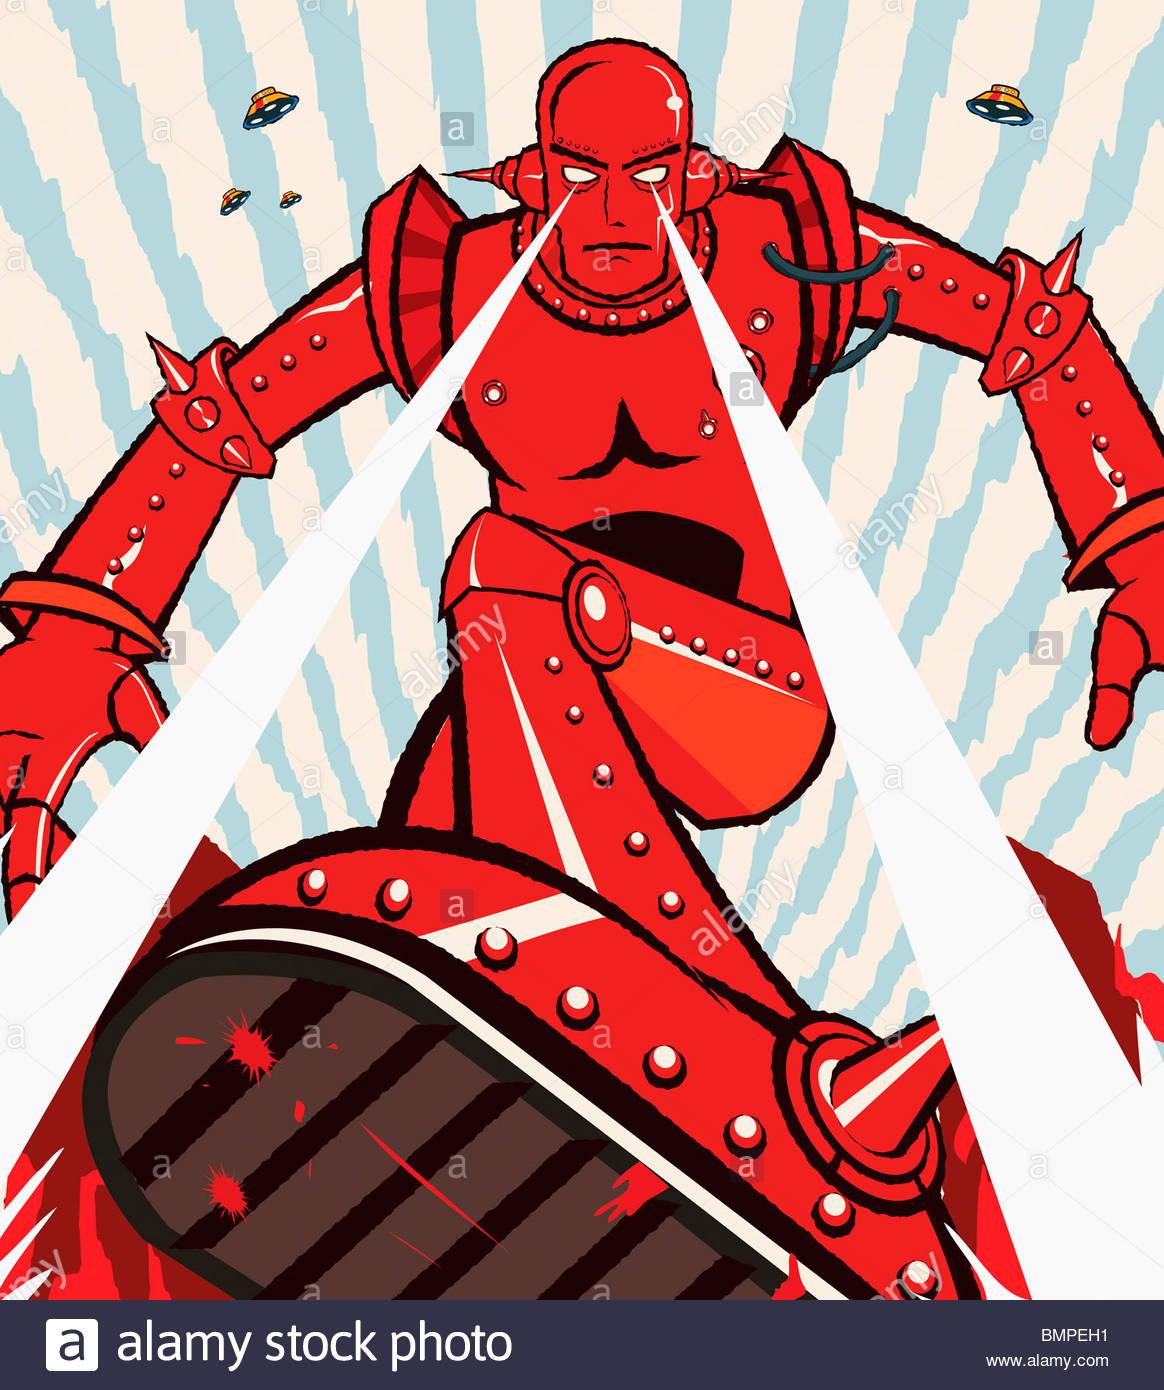 Roten Roboter Angriff mit Strahlen aus den Augen Stockbild